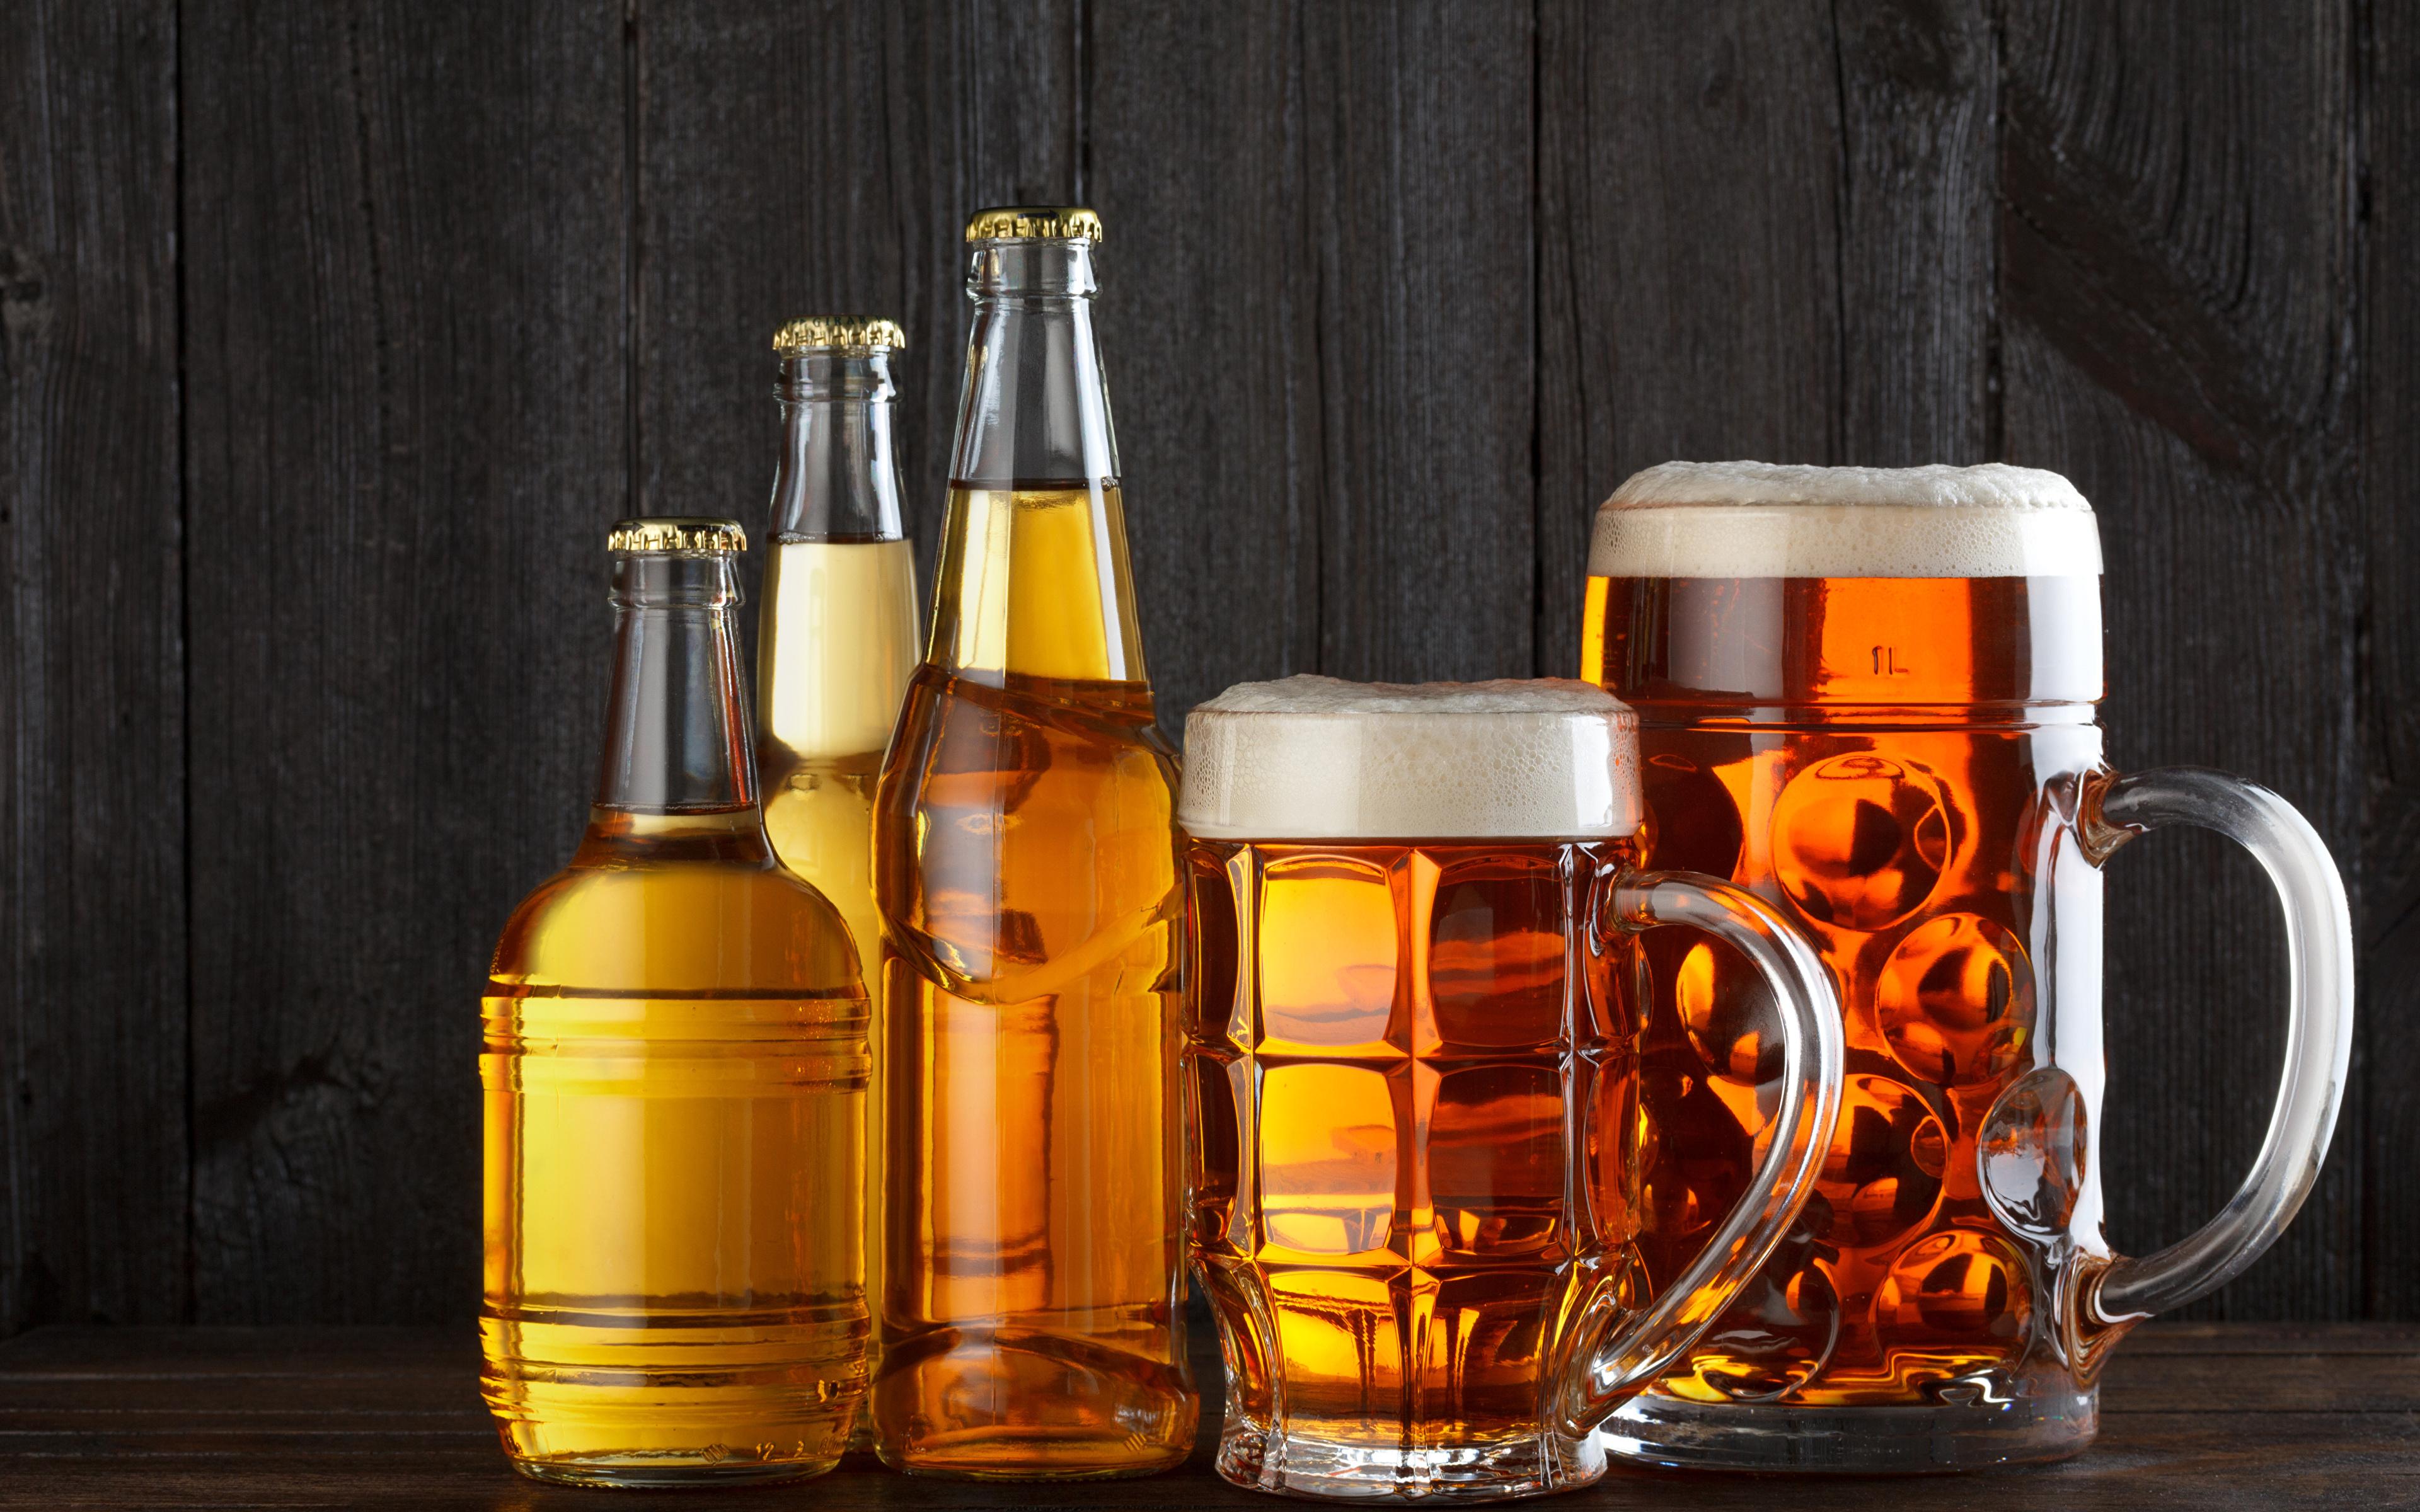 Images Beer Mug Foam Food Bottles Drinks 3840x2400